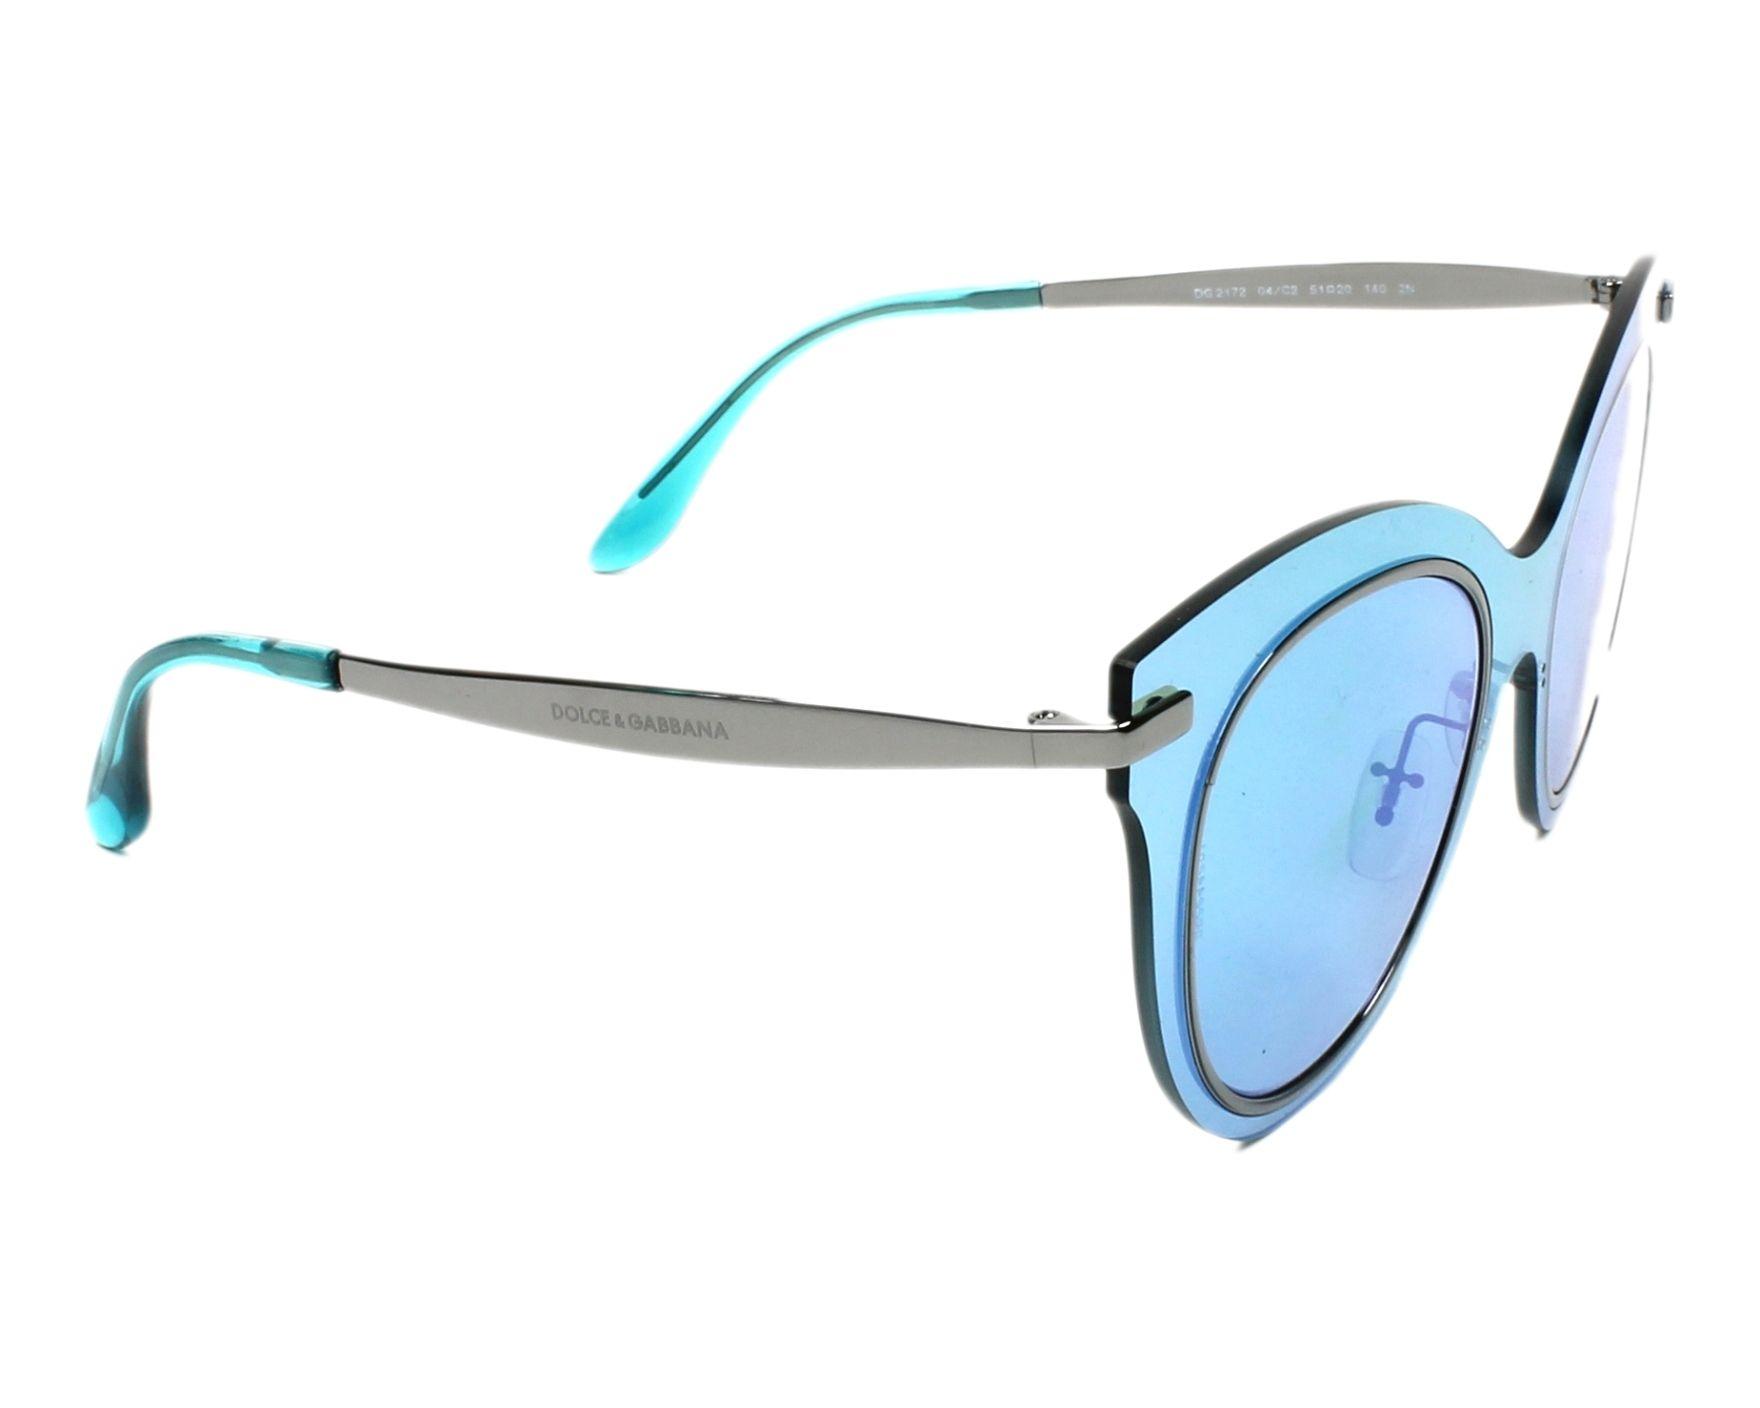 dolce gabbana sunglasses dg 2172 04 c2 gun visionet. Black Bedroom Furniture Sets. Home Design Ideas